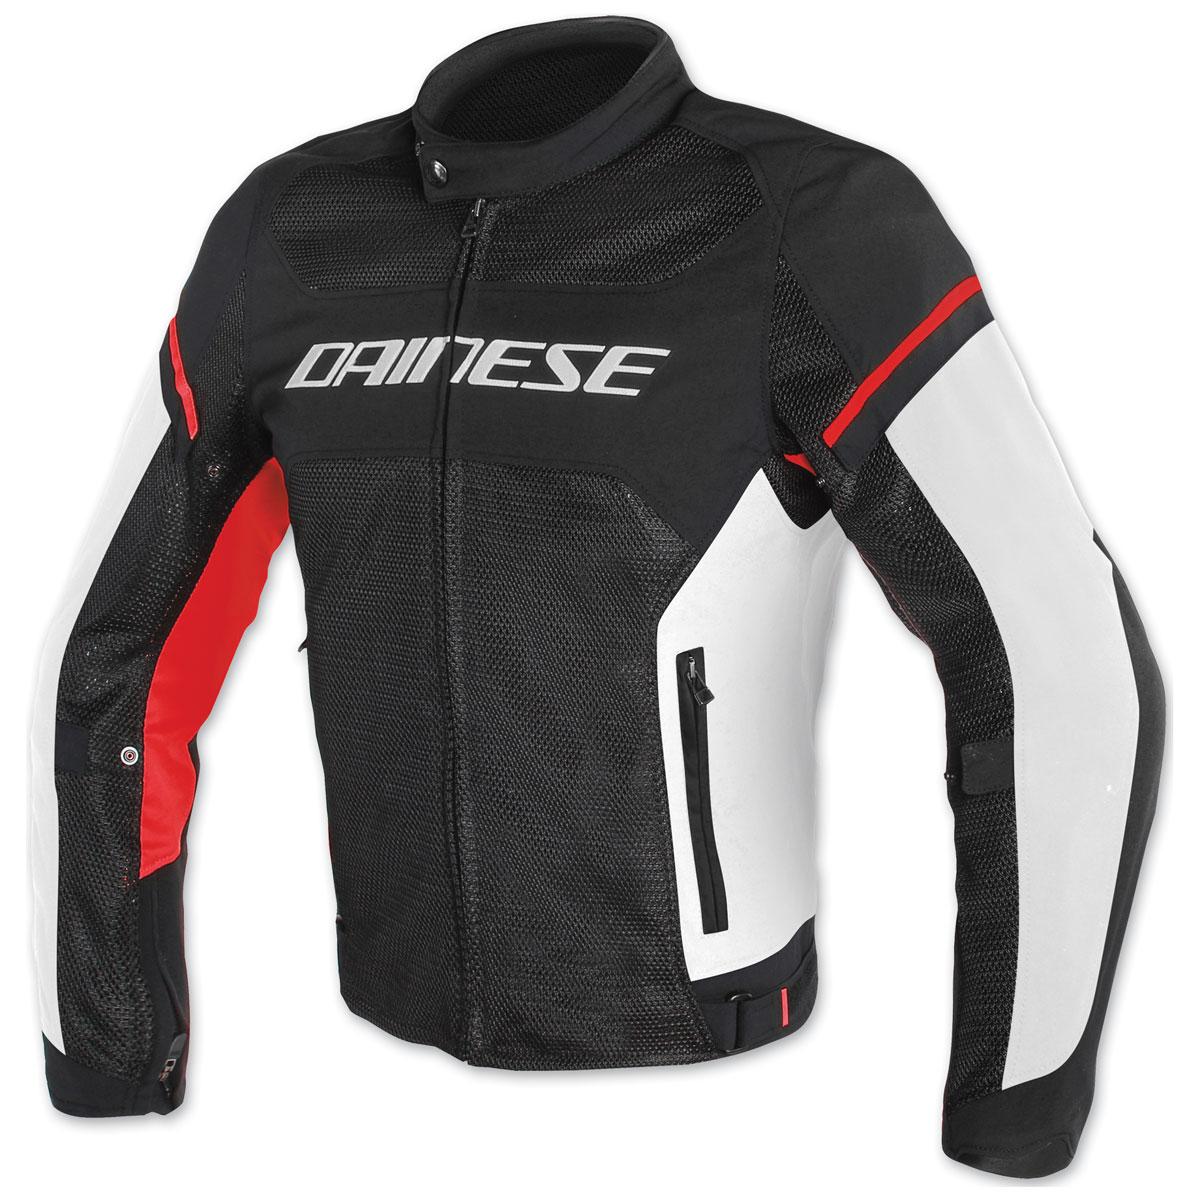 Dainese Men's Air Frame D1 Black/White/Red Jacket